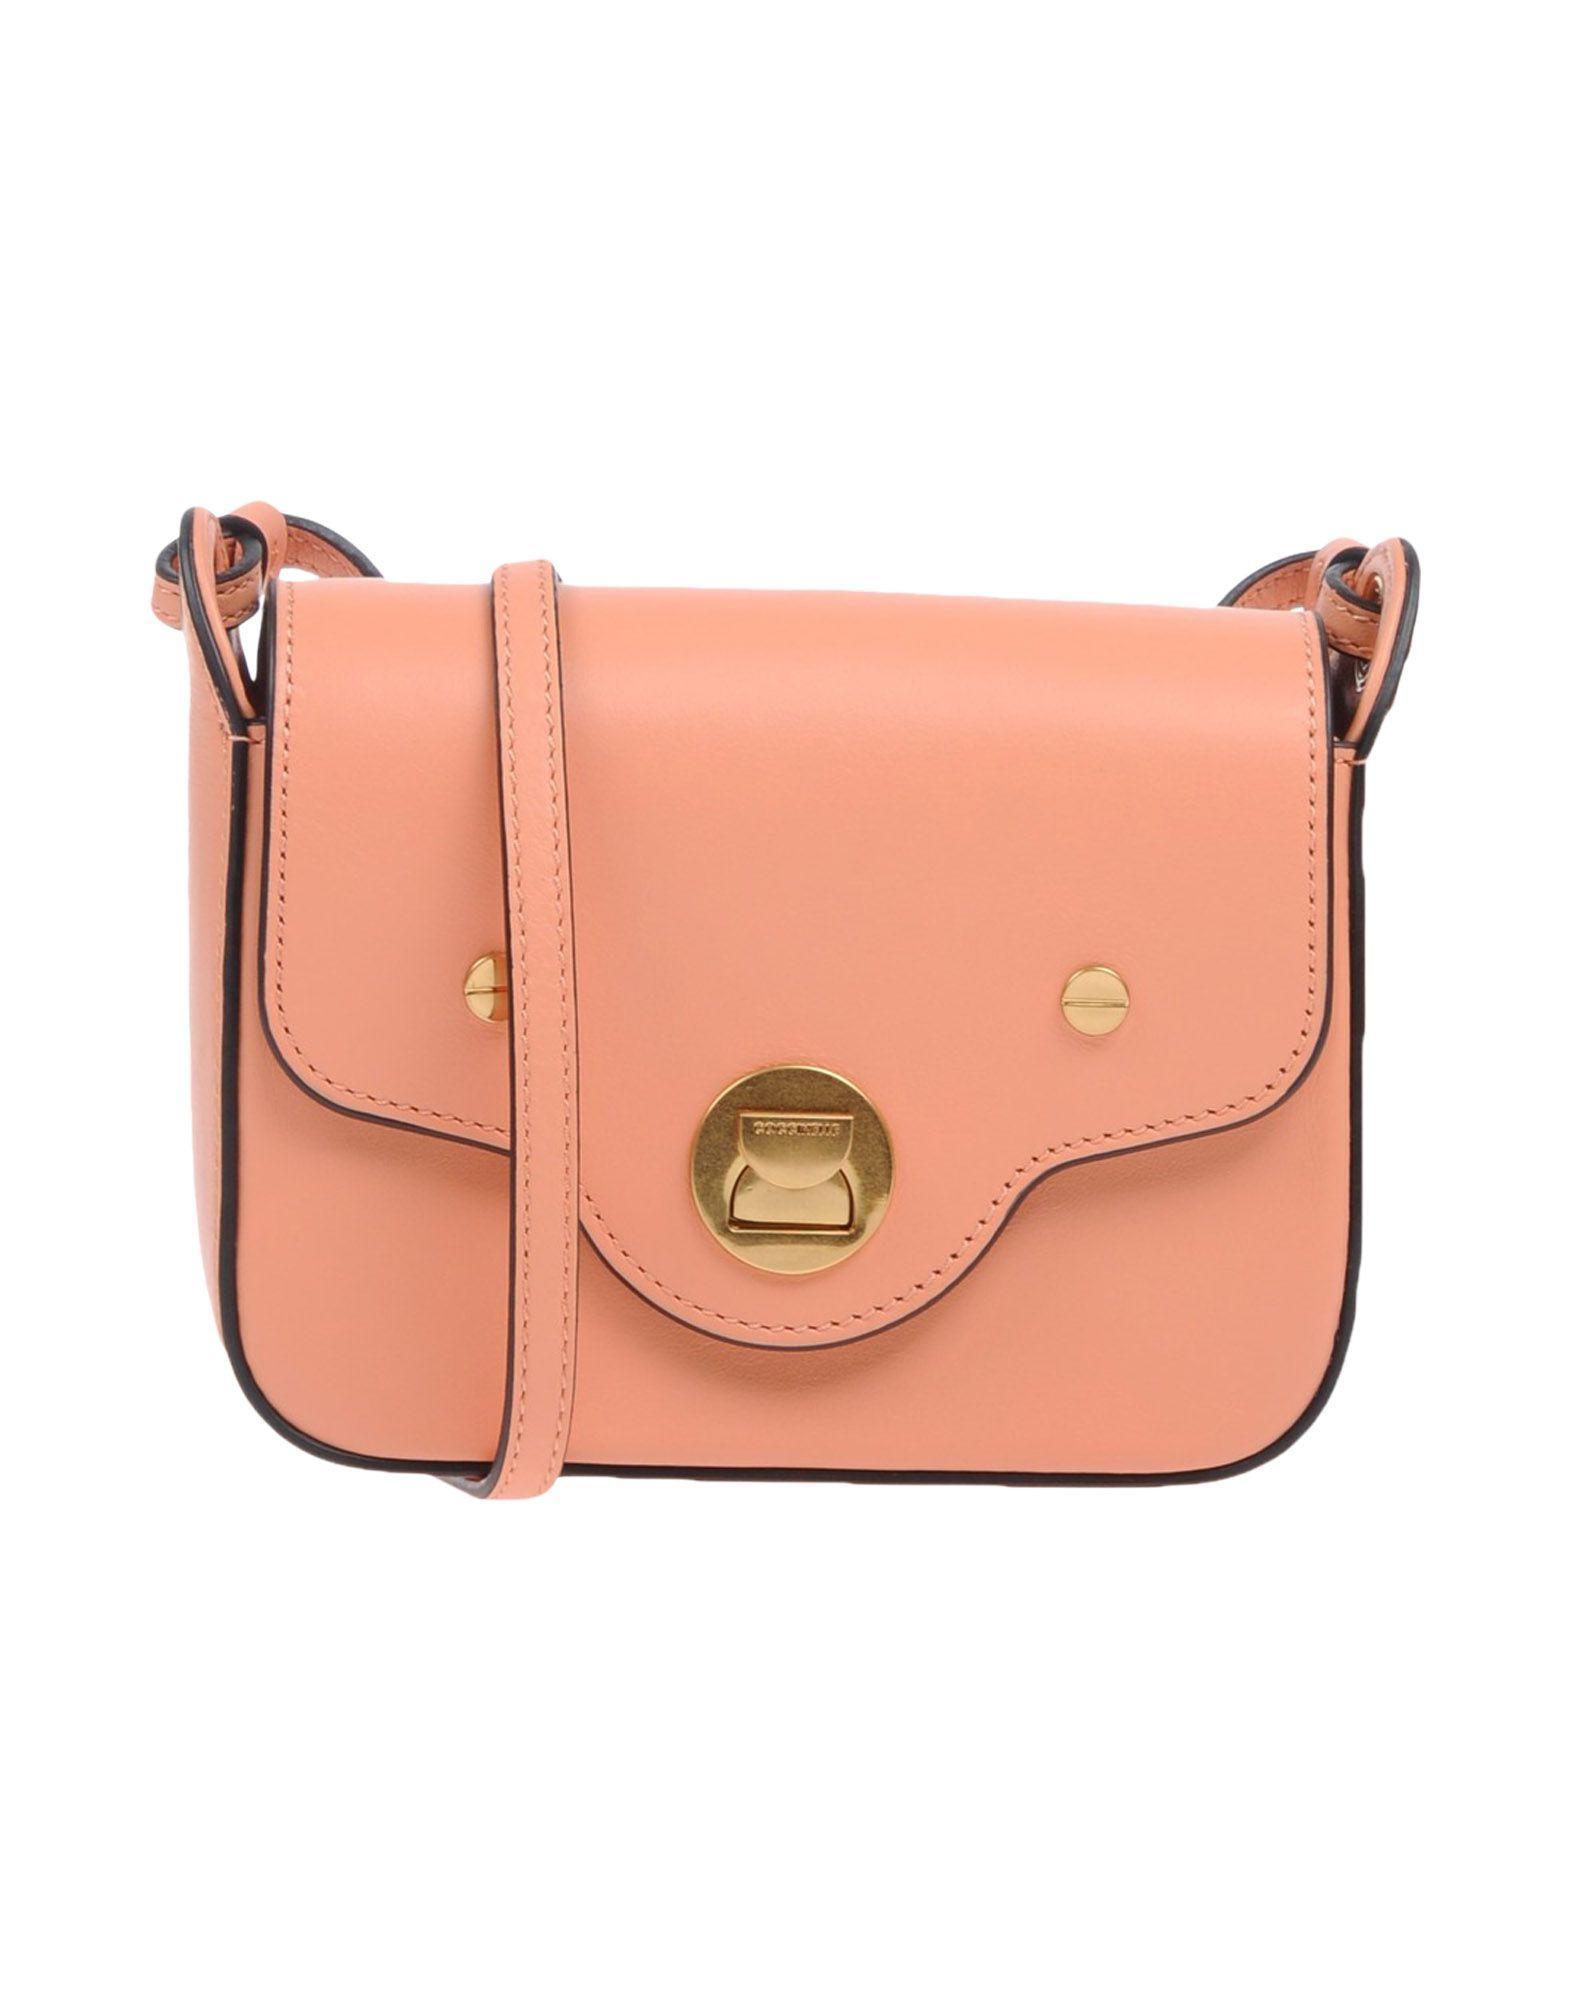 COCCINELLE Сумка через плечо сумка coccinelle c1 yb5 11 01 01 001